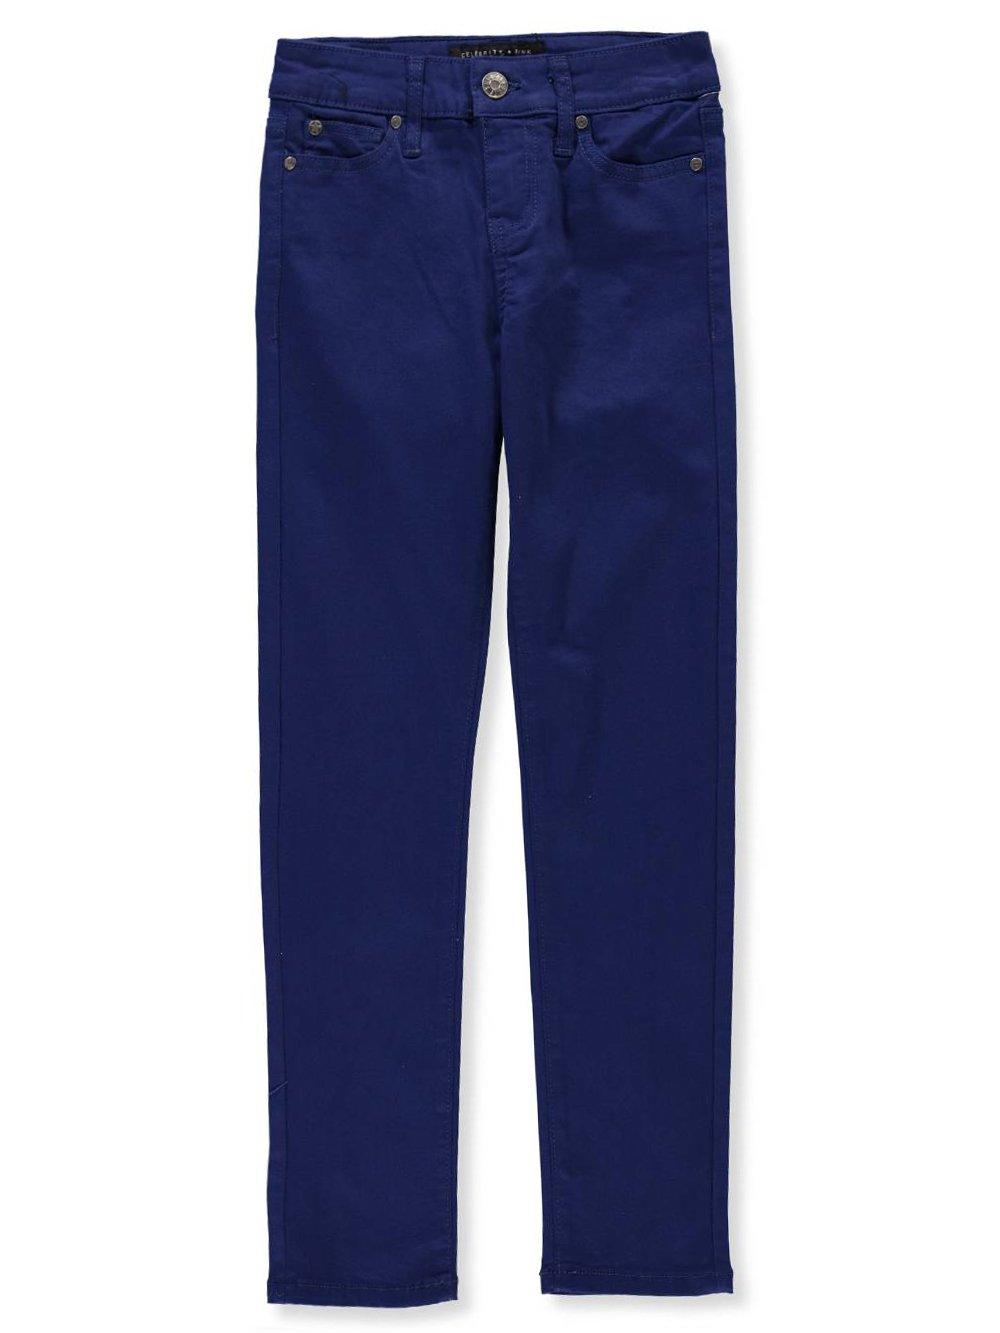 Celebrity Pink Big Girls' Stretch Twill Jeans - Navy, 10